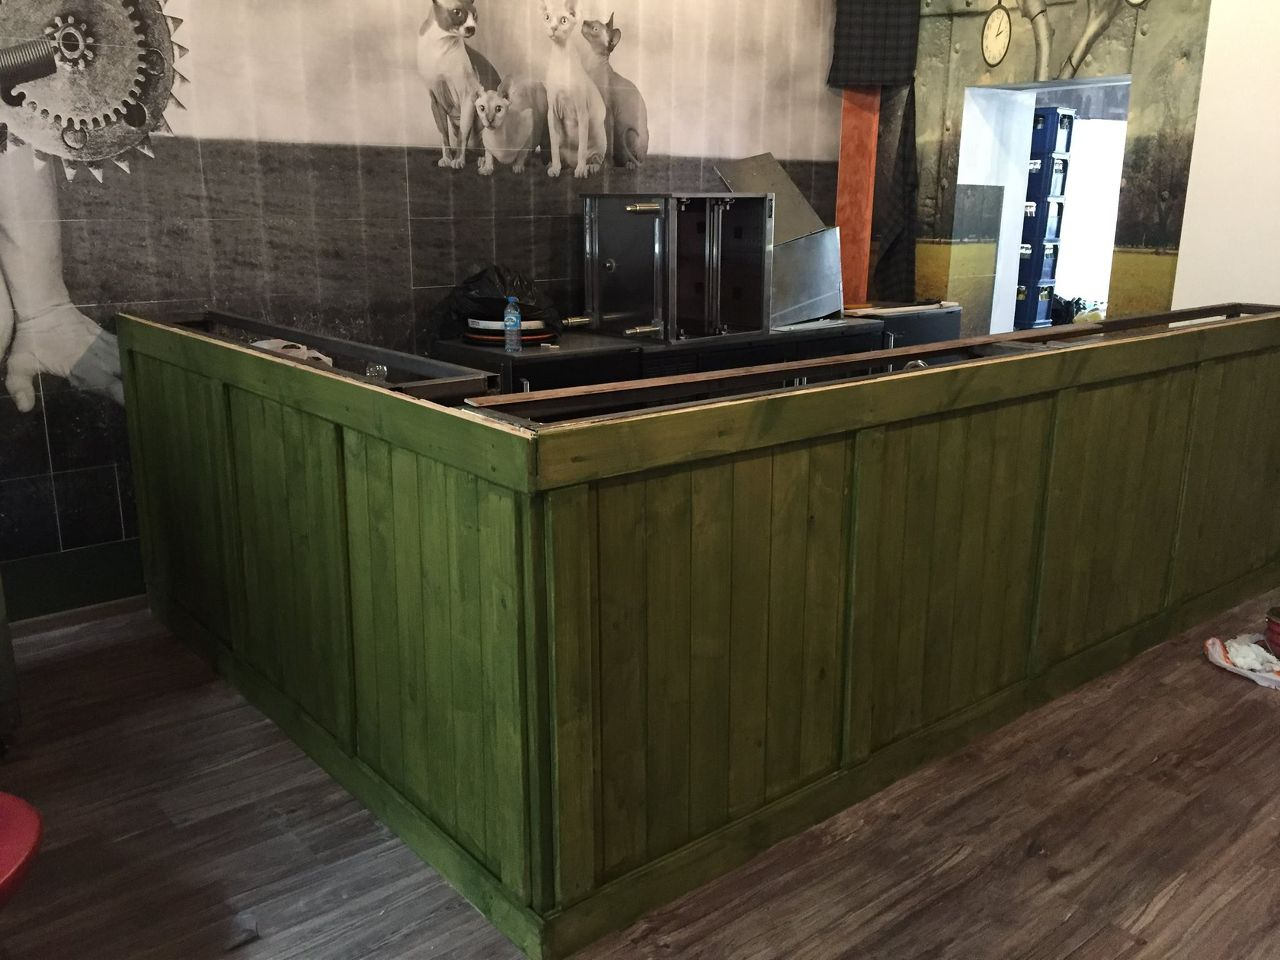 Photo 1 of Ceregiele Cafe & Pub